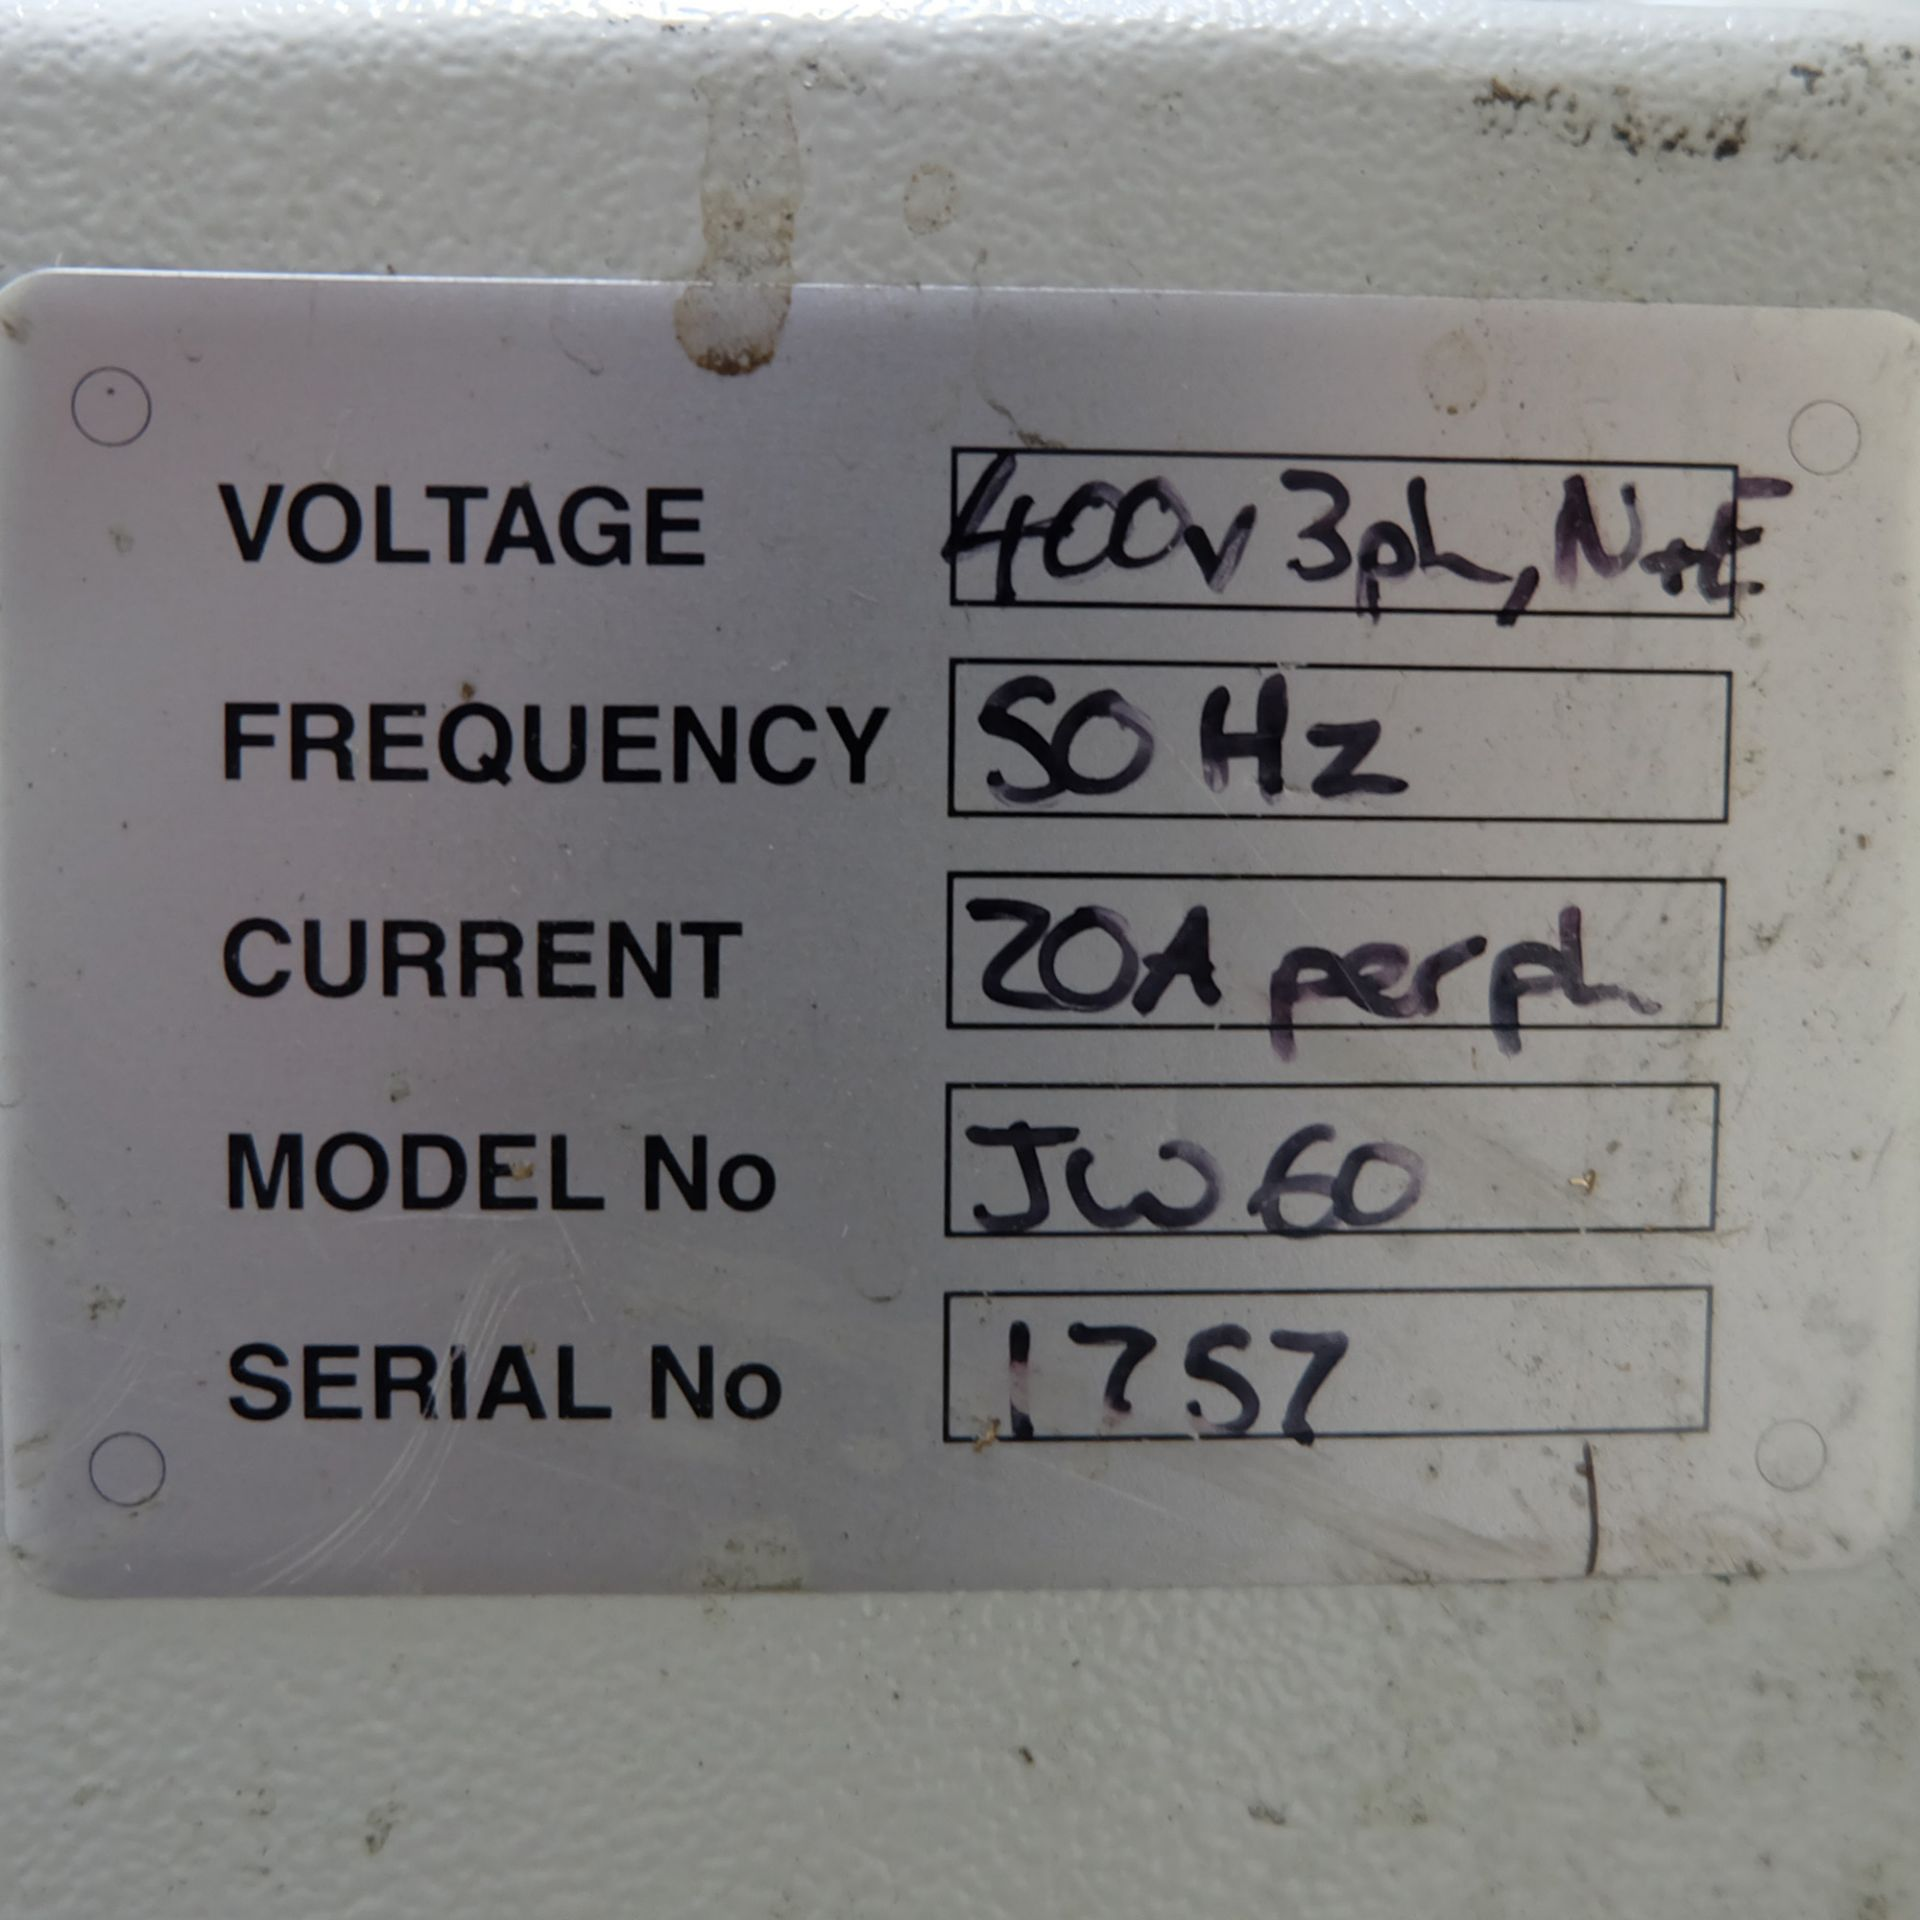 Vixen Jetwash Model JW60 Automatic Hot Wash Rotary Spray Machine. Bowl Size 600mm x 260mm. - Image 8 of 8